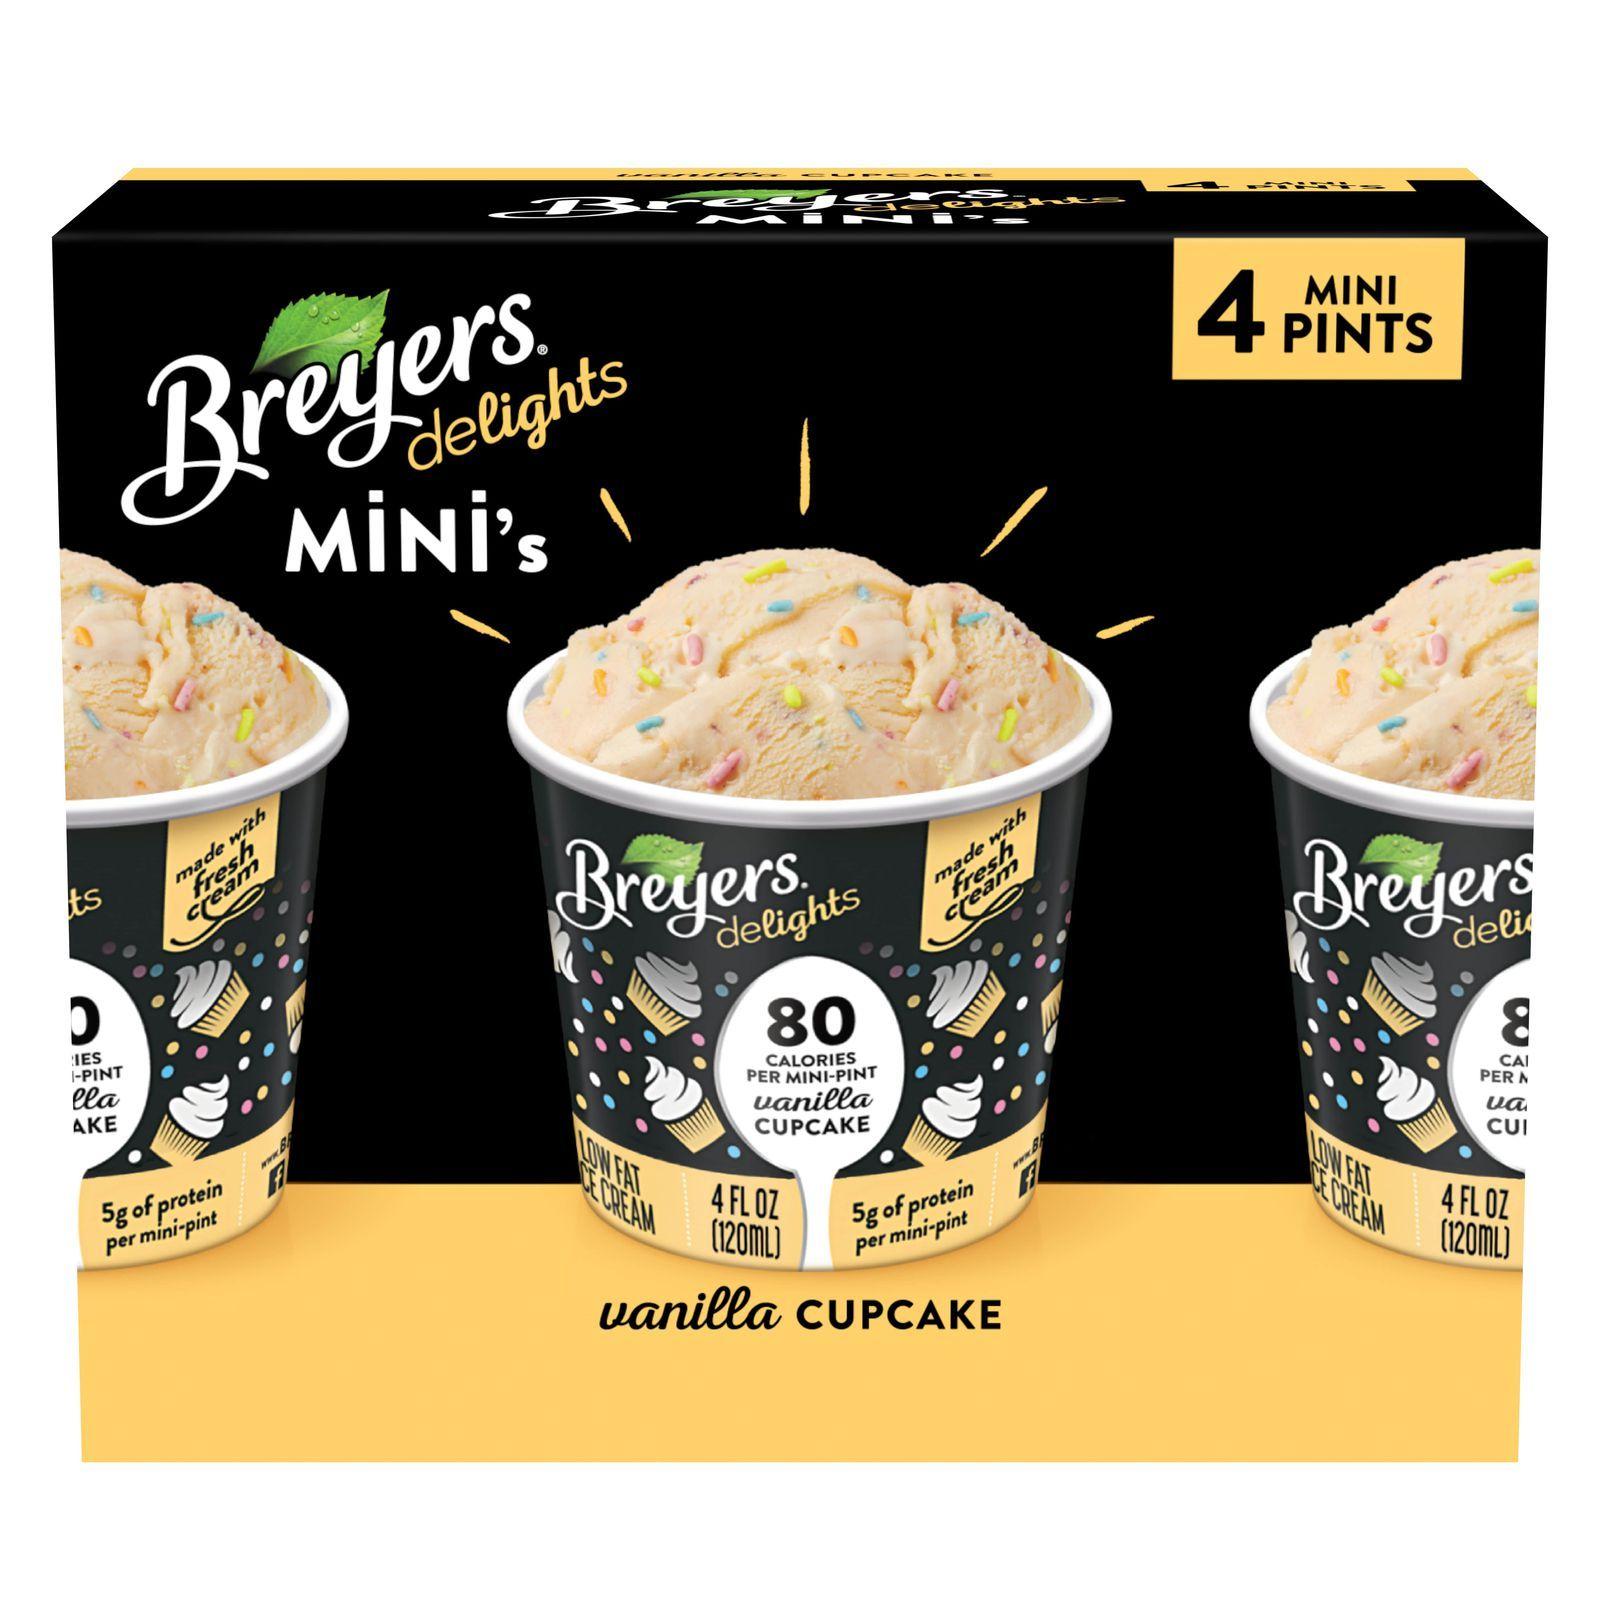 Breyers Now Sells 80 Calorie Mini Tubs Of Ice Cream That Taste